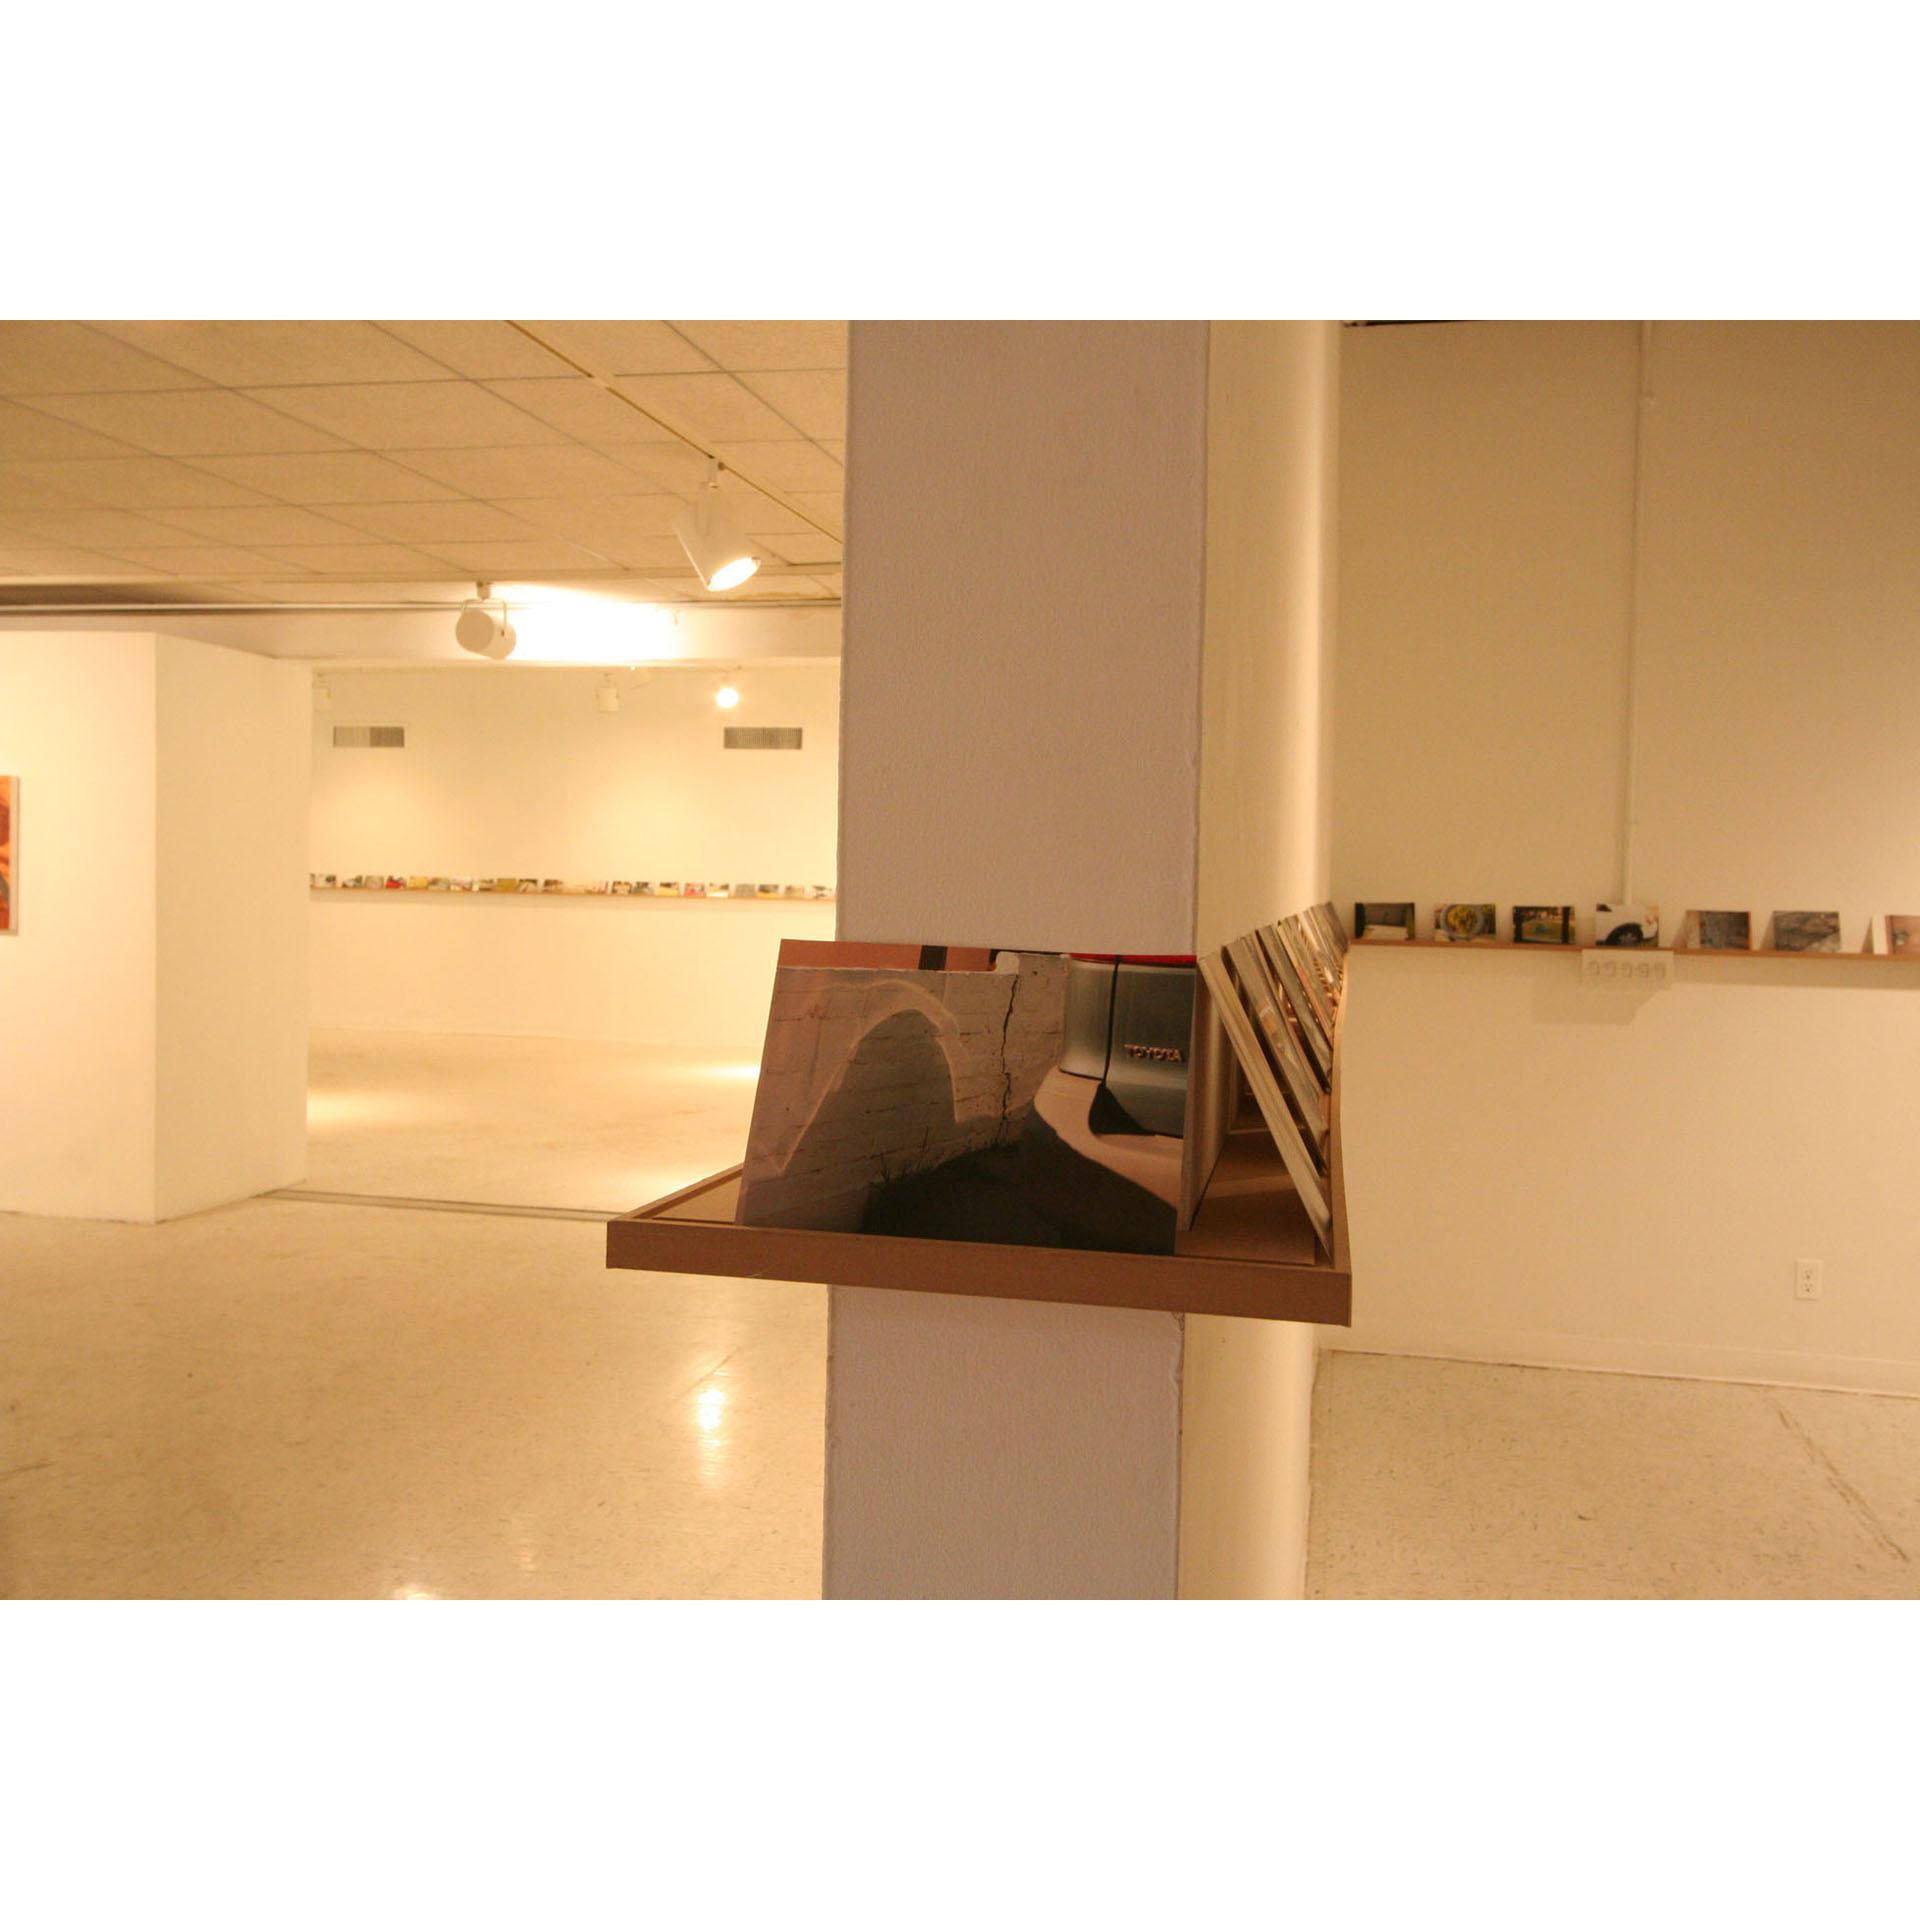 05_Lorri Deyer - CCF - thesis show mask.jpg